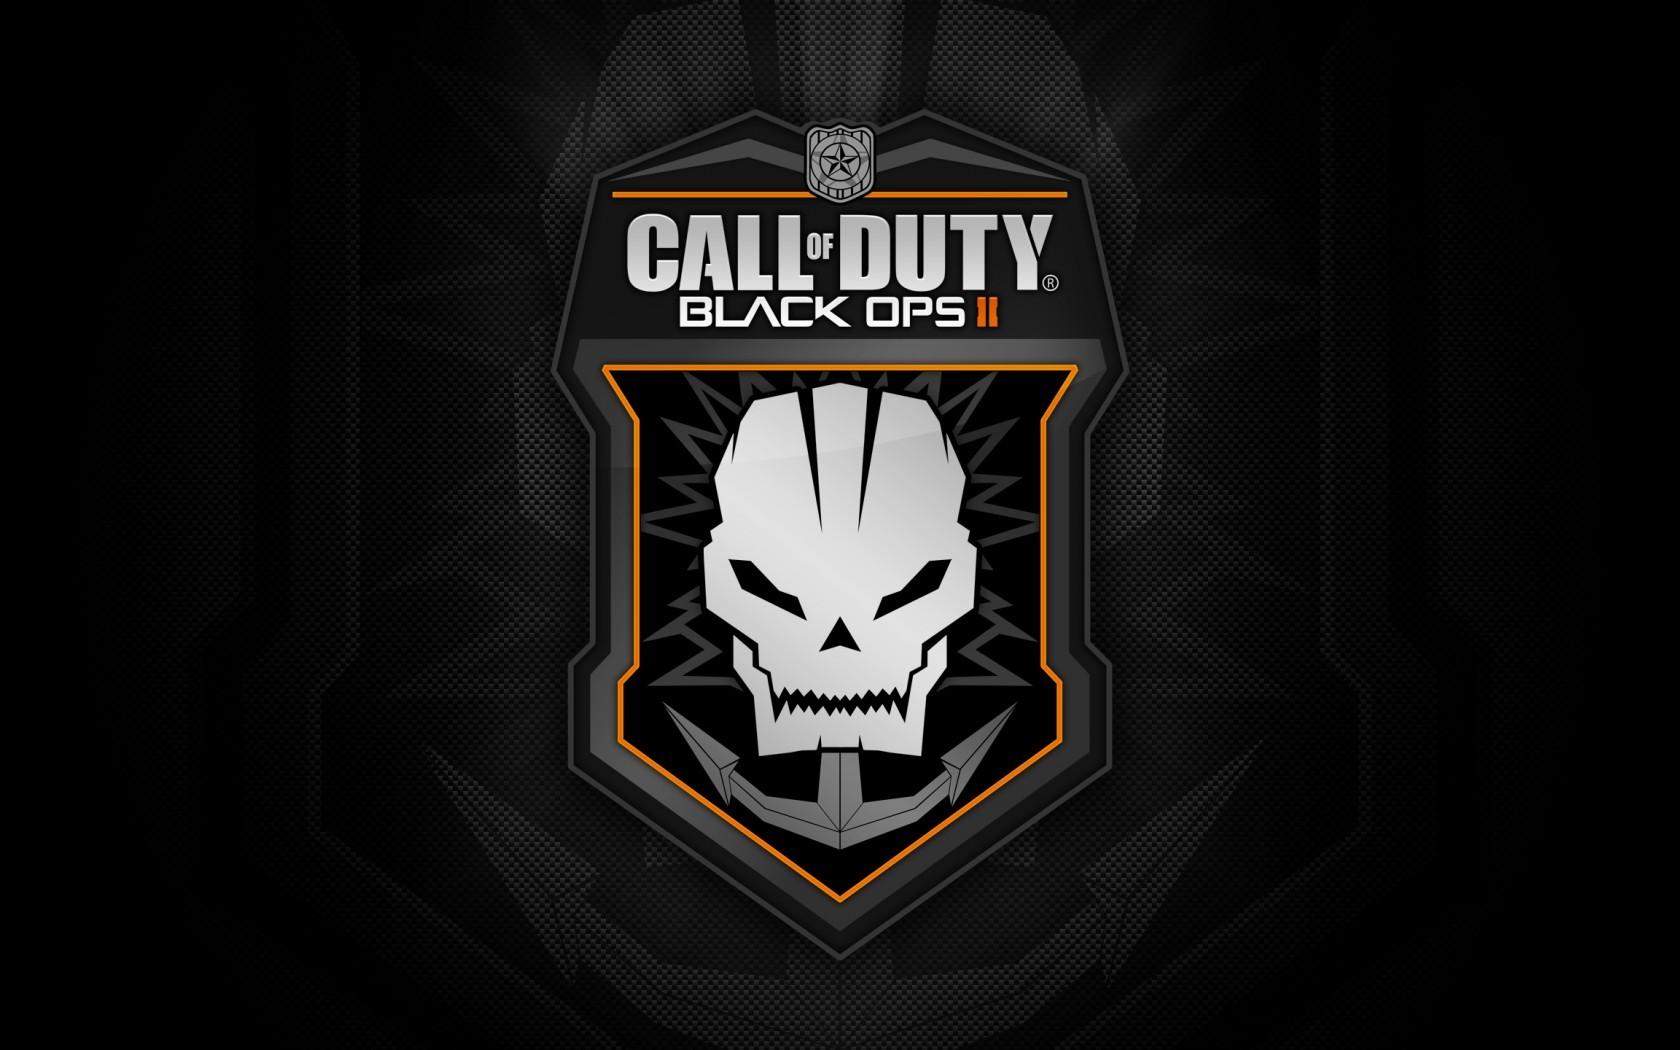 Handy-Wallpaper Spiele, Logos, Call Of Duty (Cod) kostenlos herunterladen.